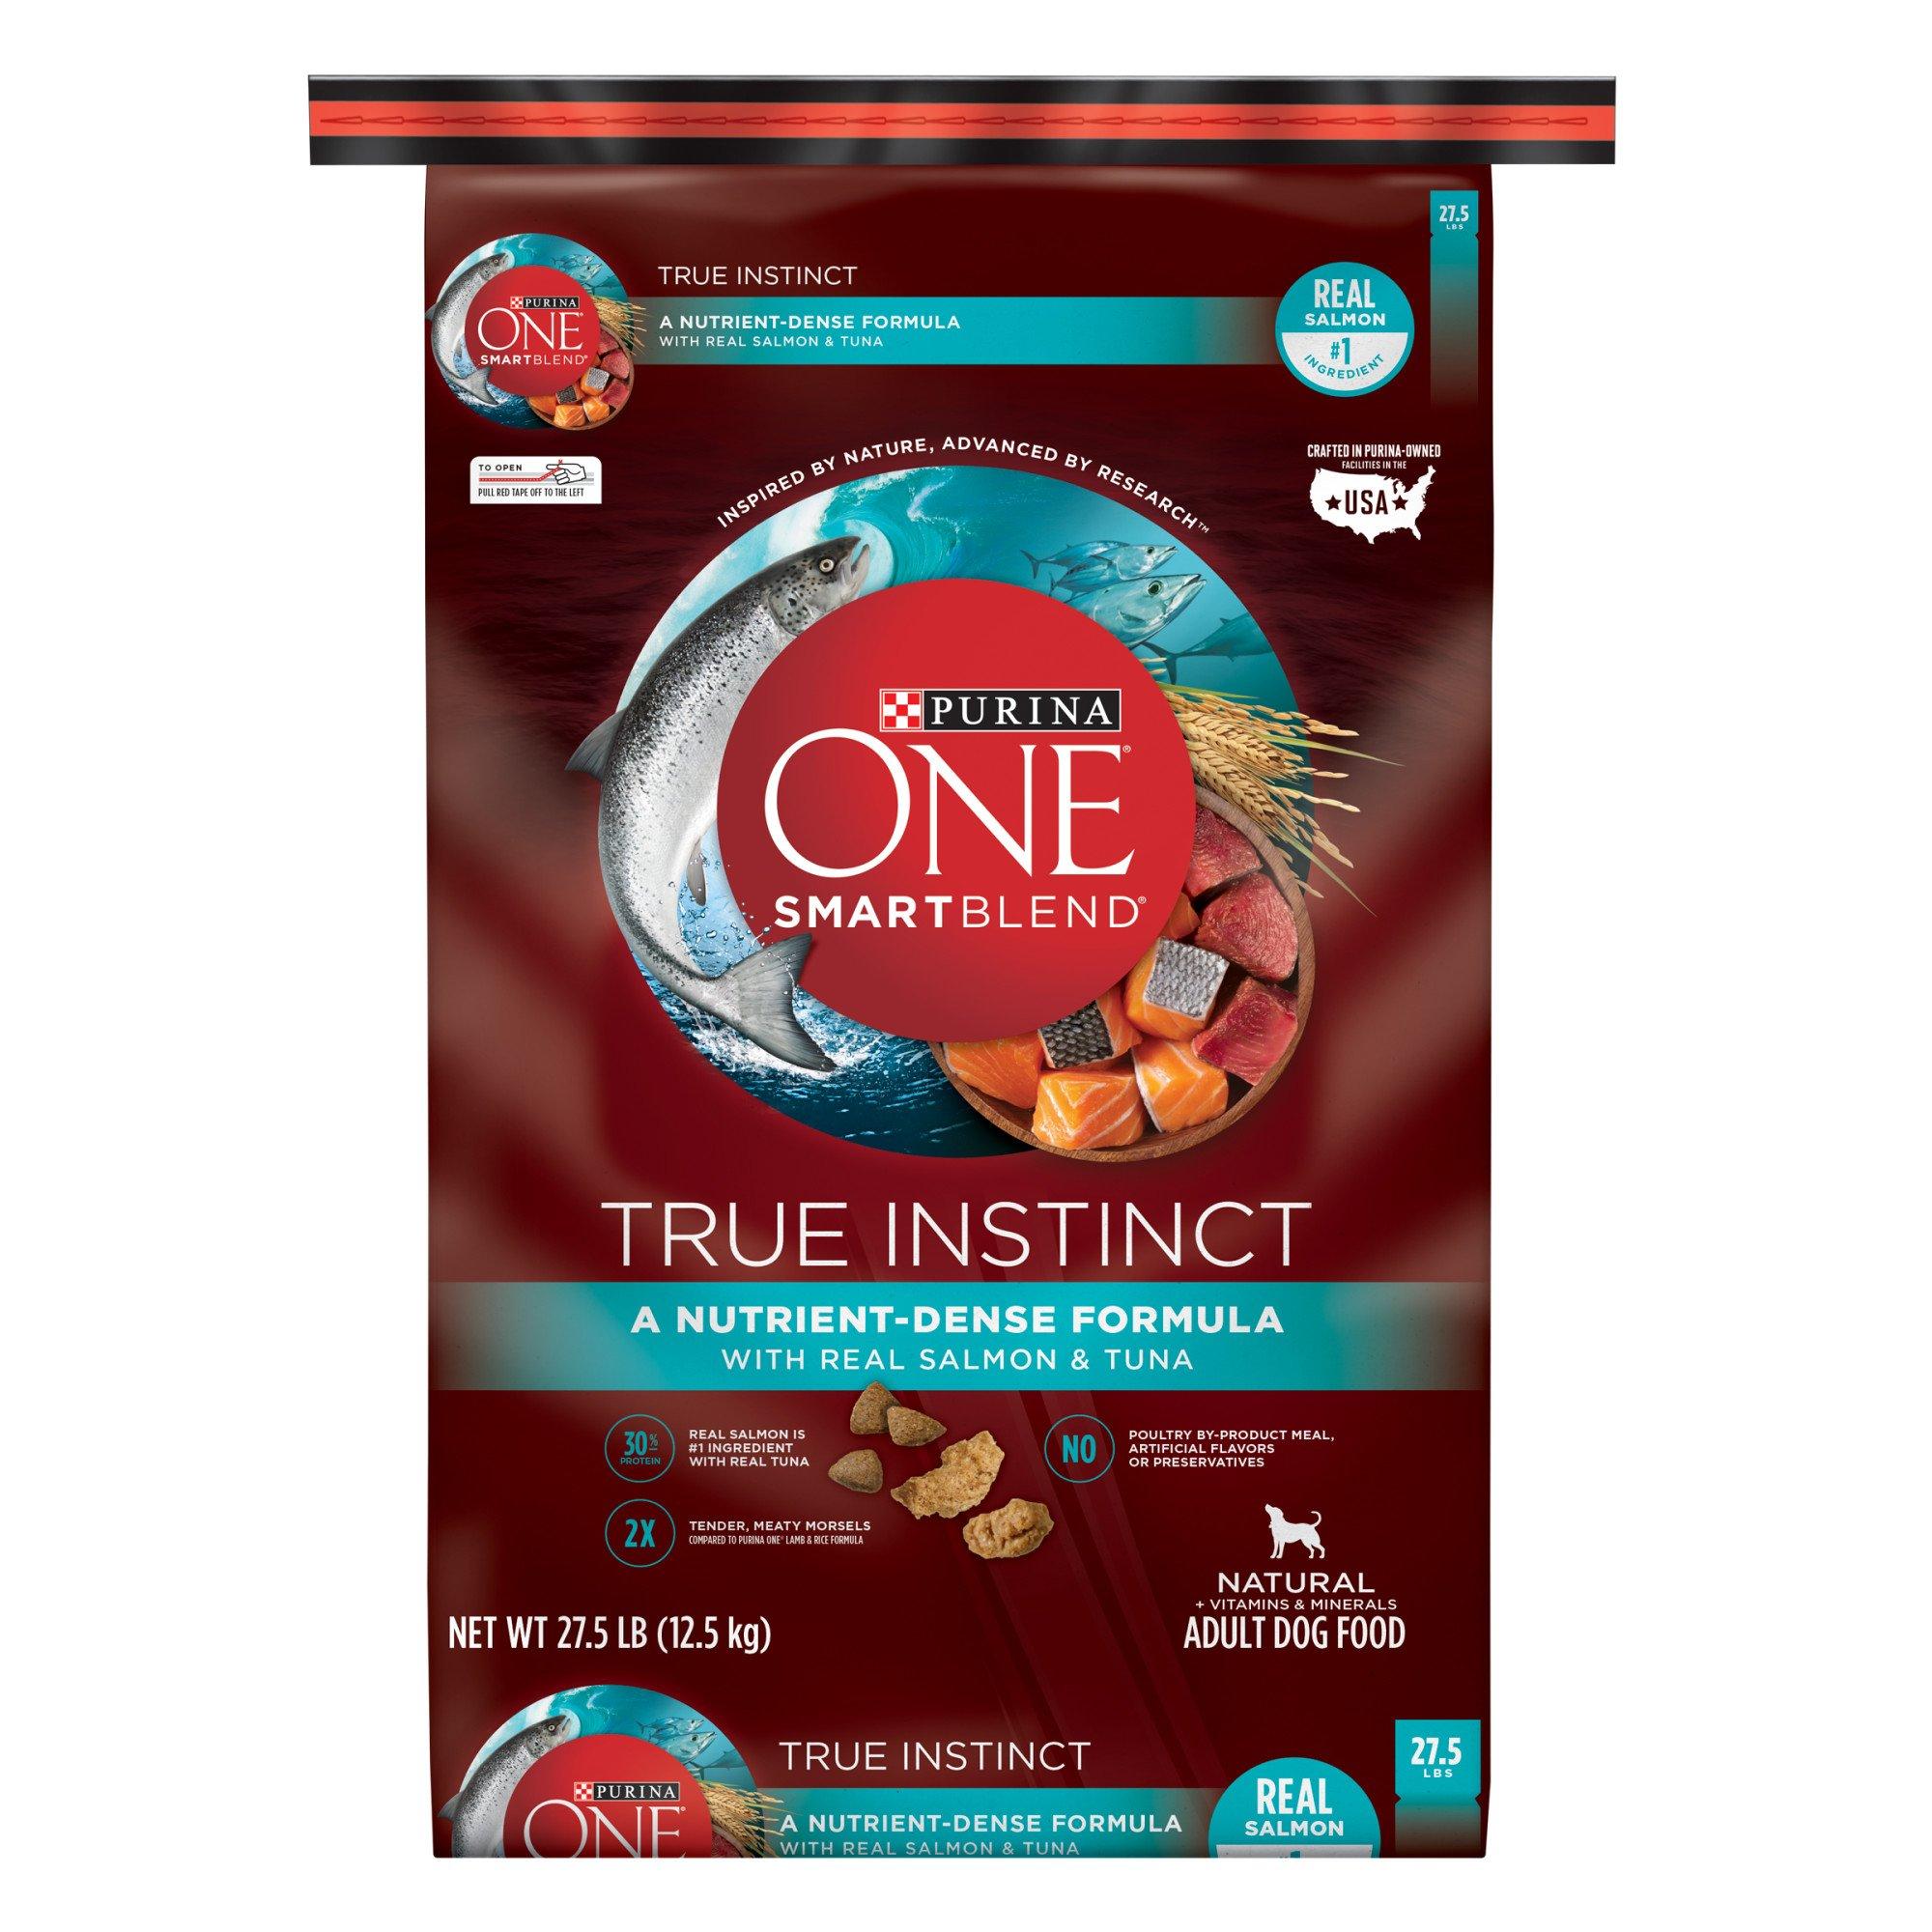 ONE True Instinct Salmon and Tuna Adult Dog Food